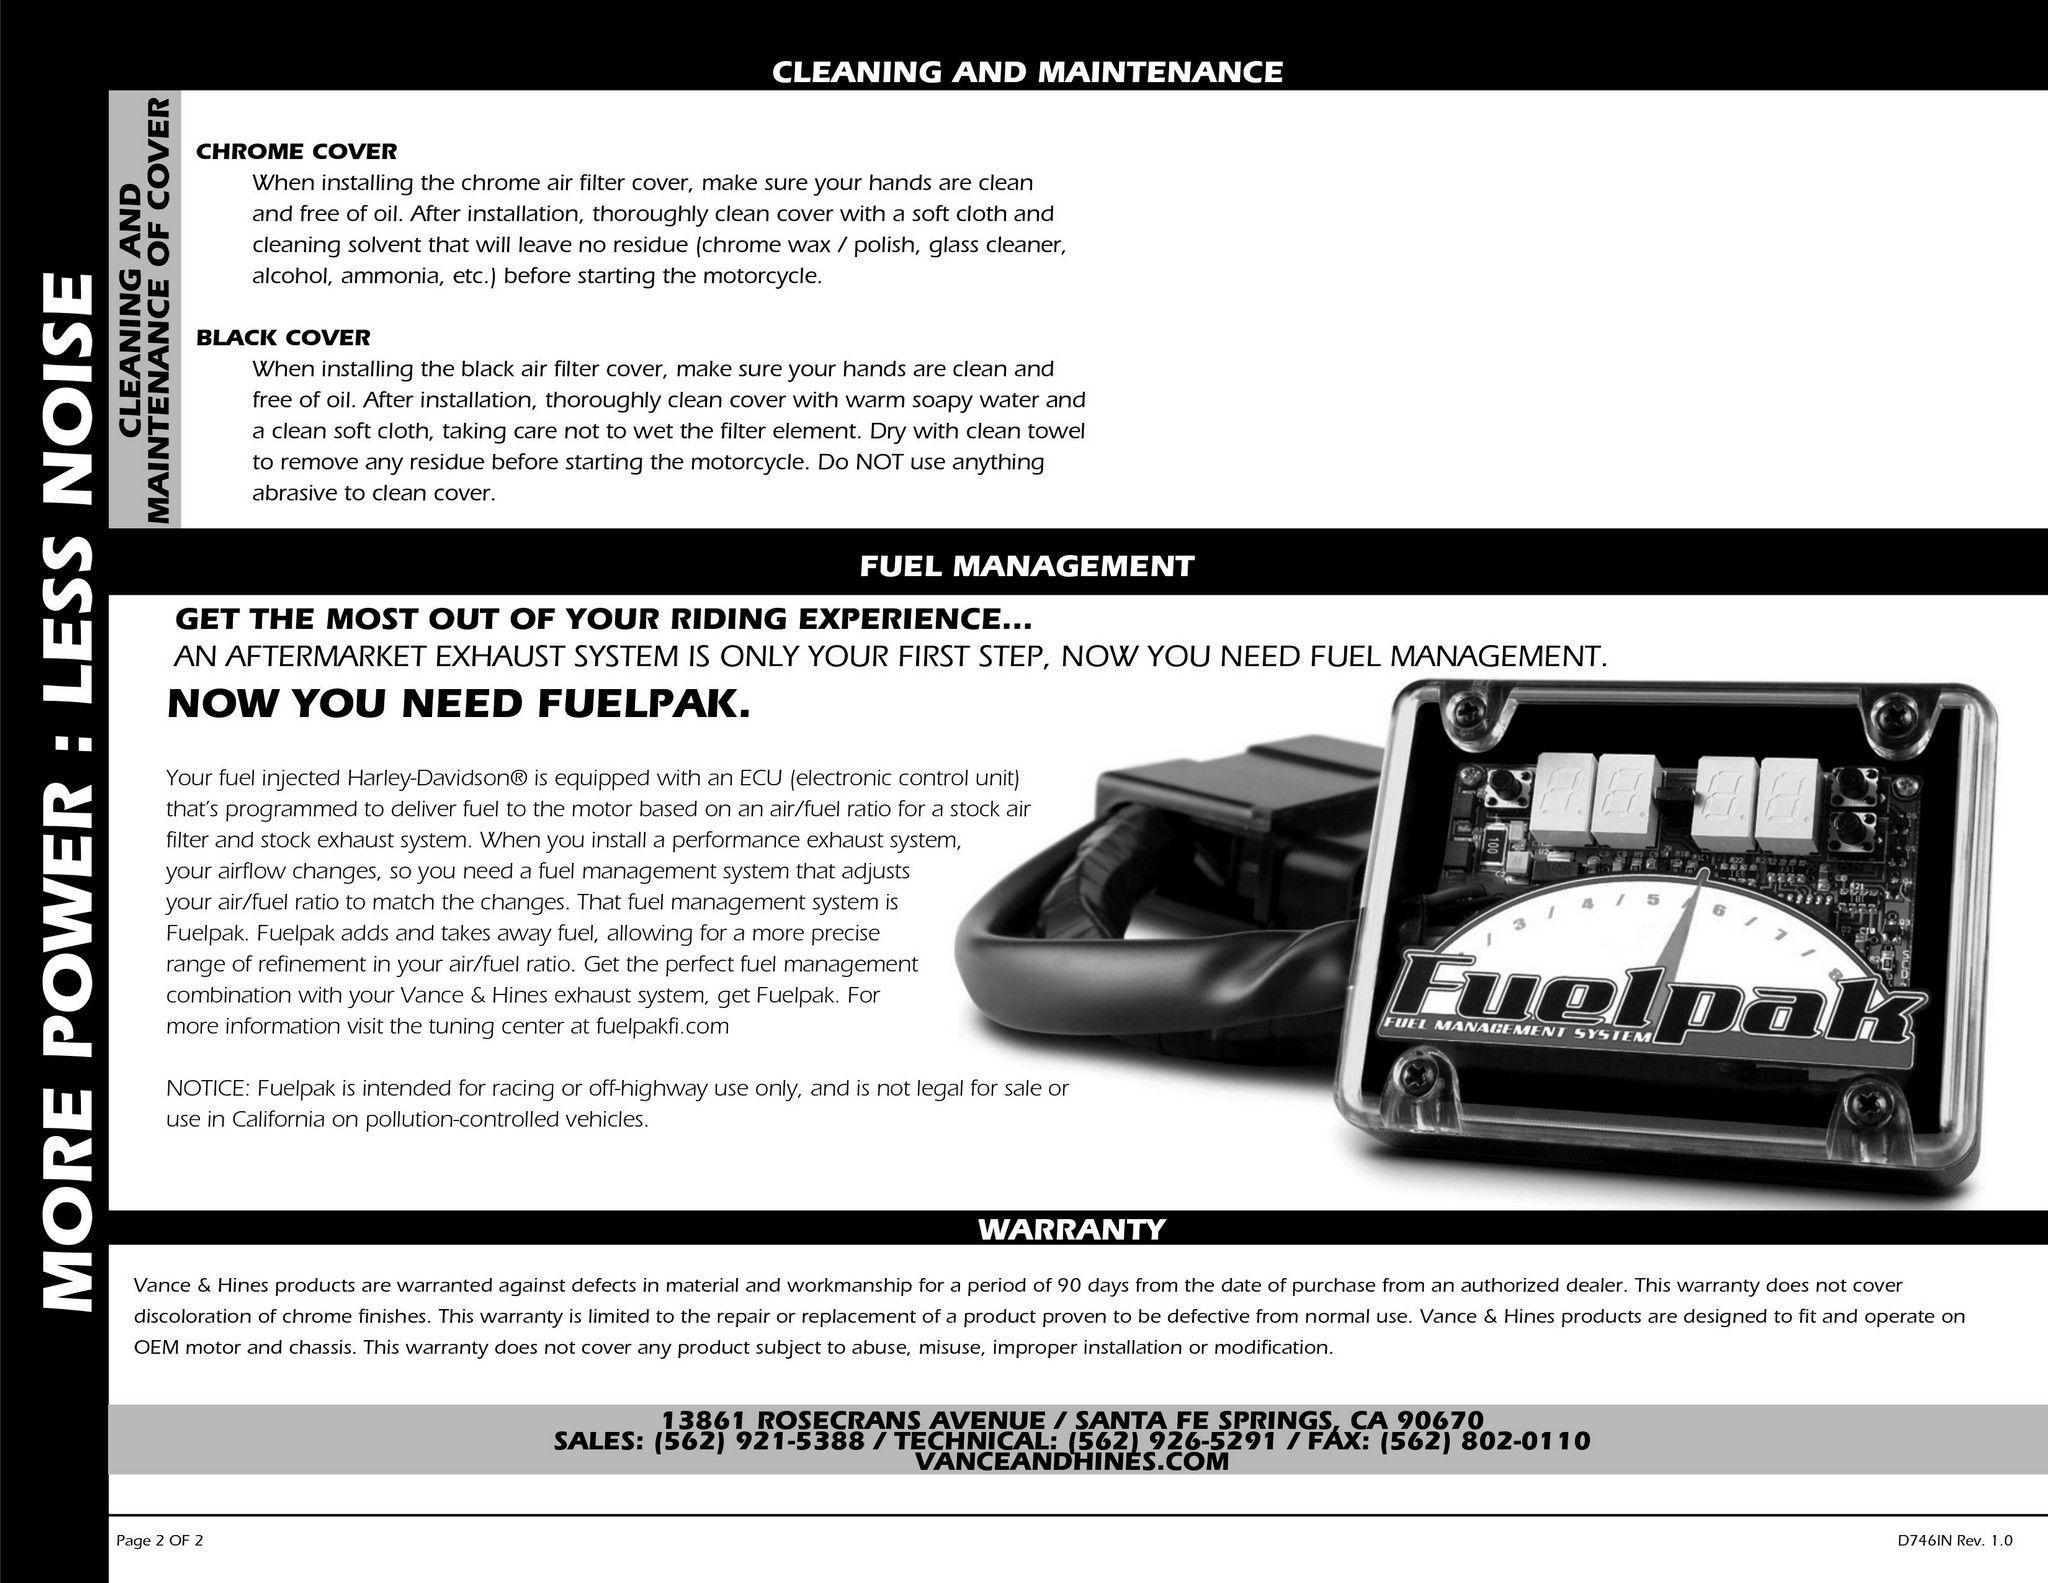 【VANCE&HINES】SKULLCAP COVER MULTI-FIT 99-11 空濾外蓋(選配及維修用) - 「Webike-摩托百貨」